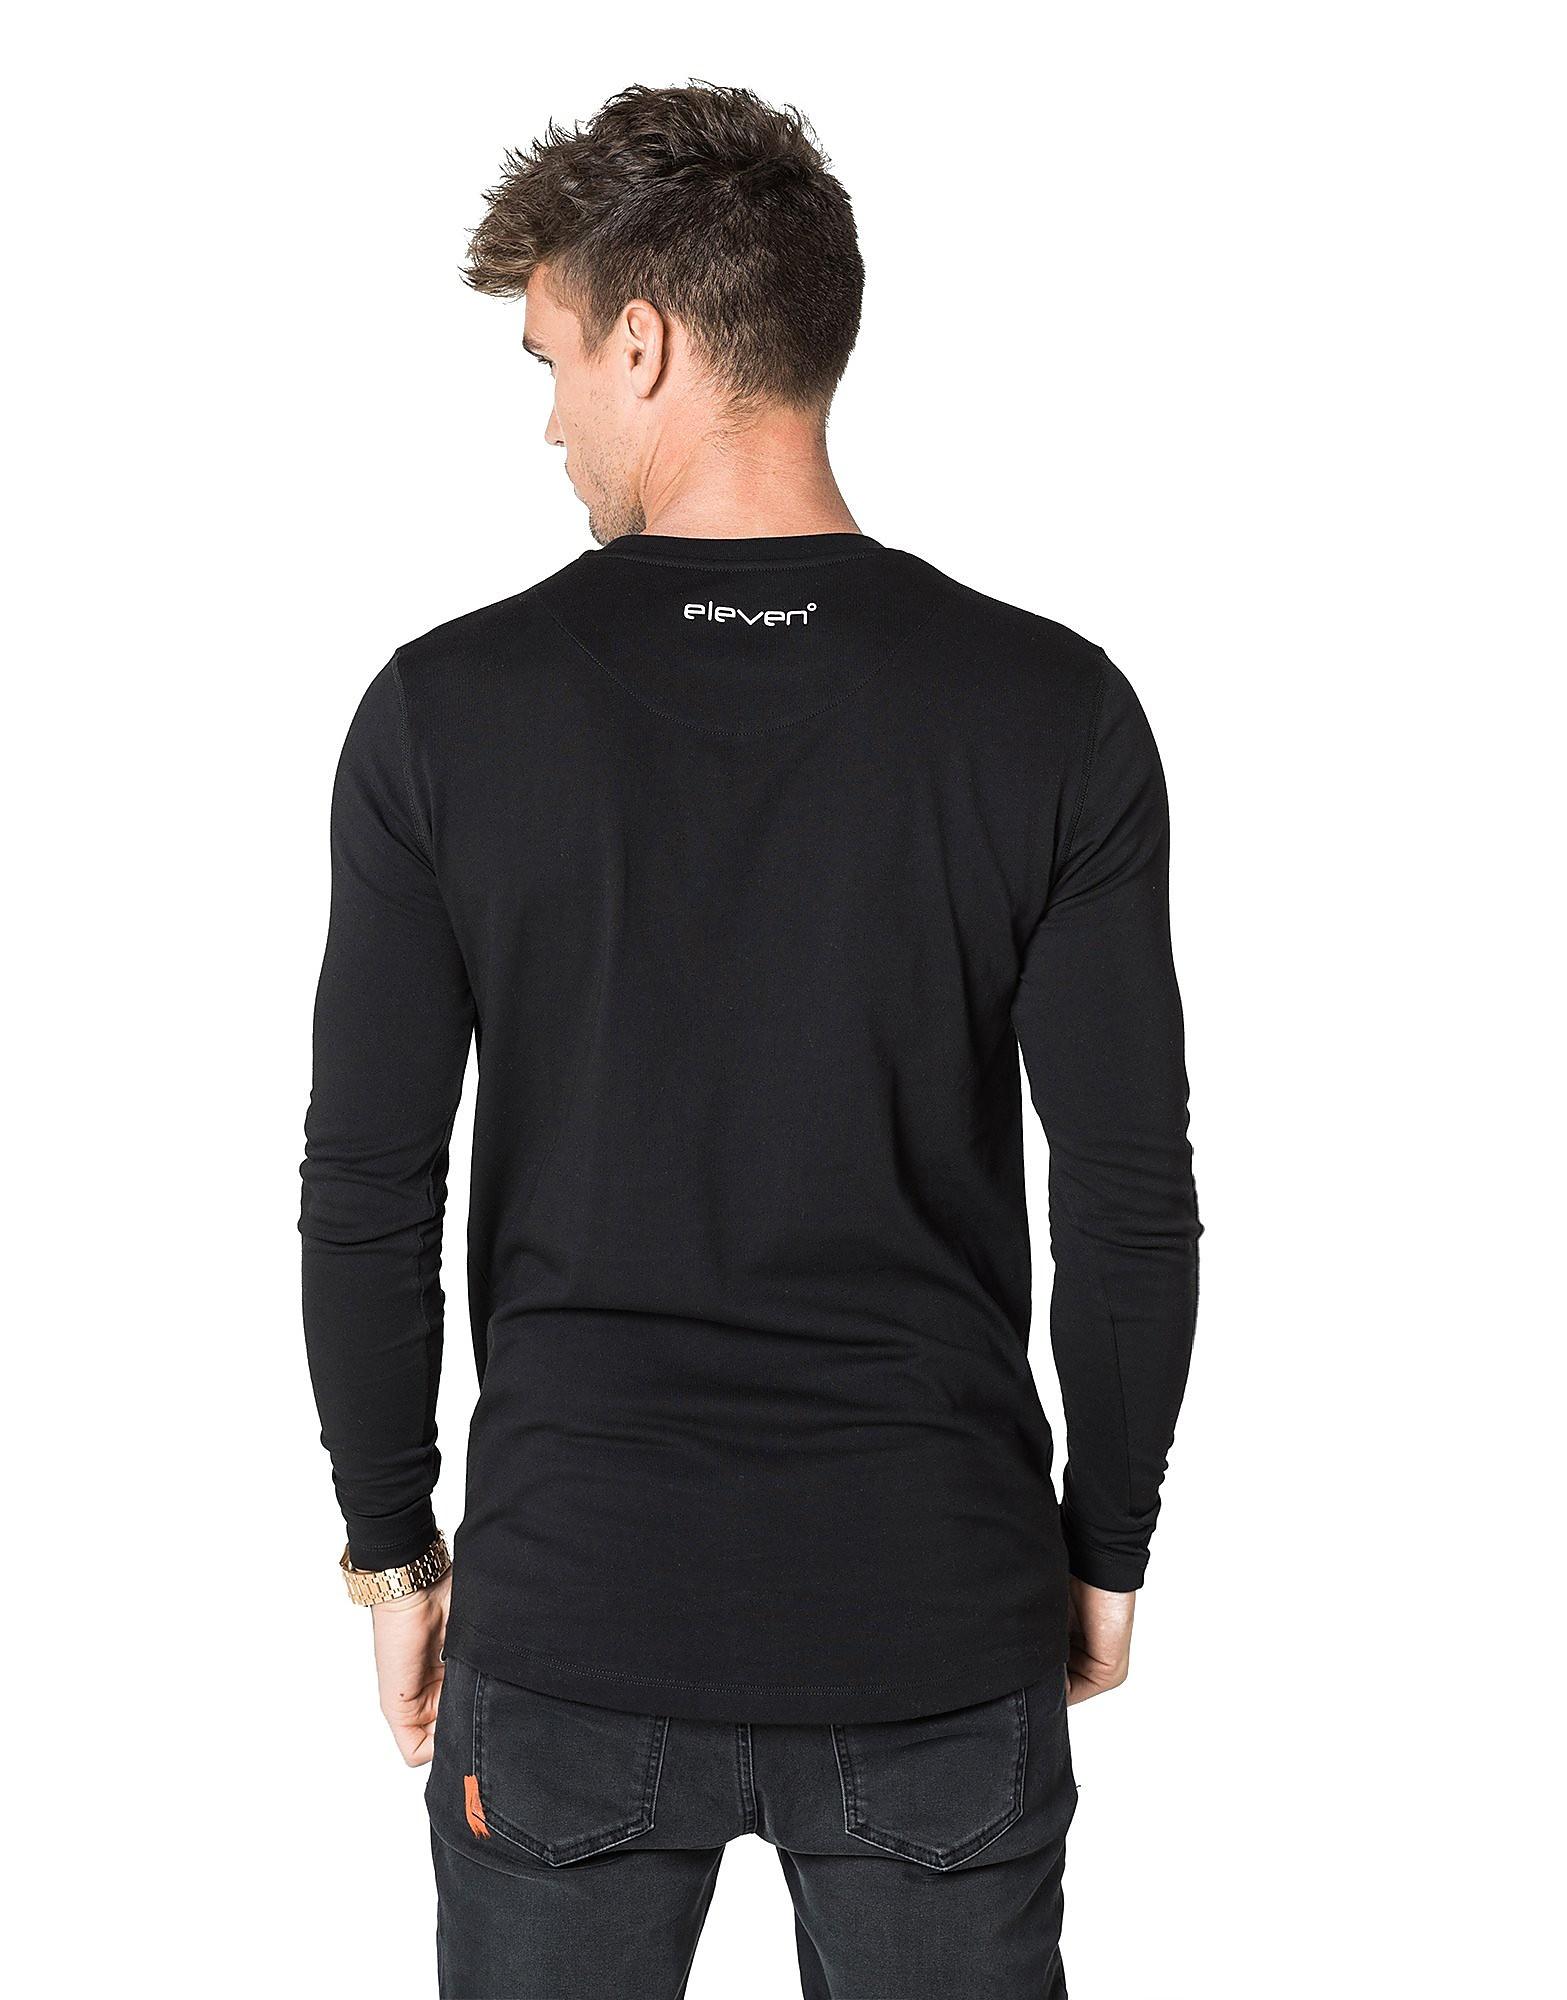 11 Degrees Core Small Logo Longsleeve T-Shirt